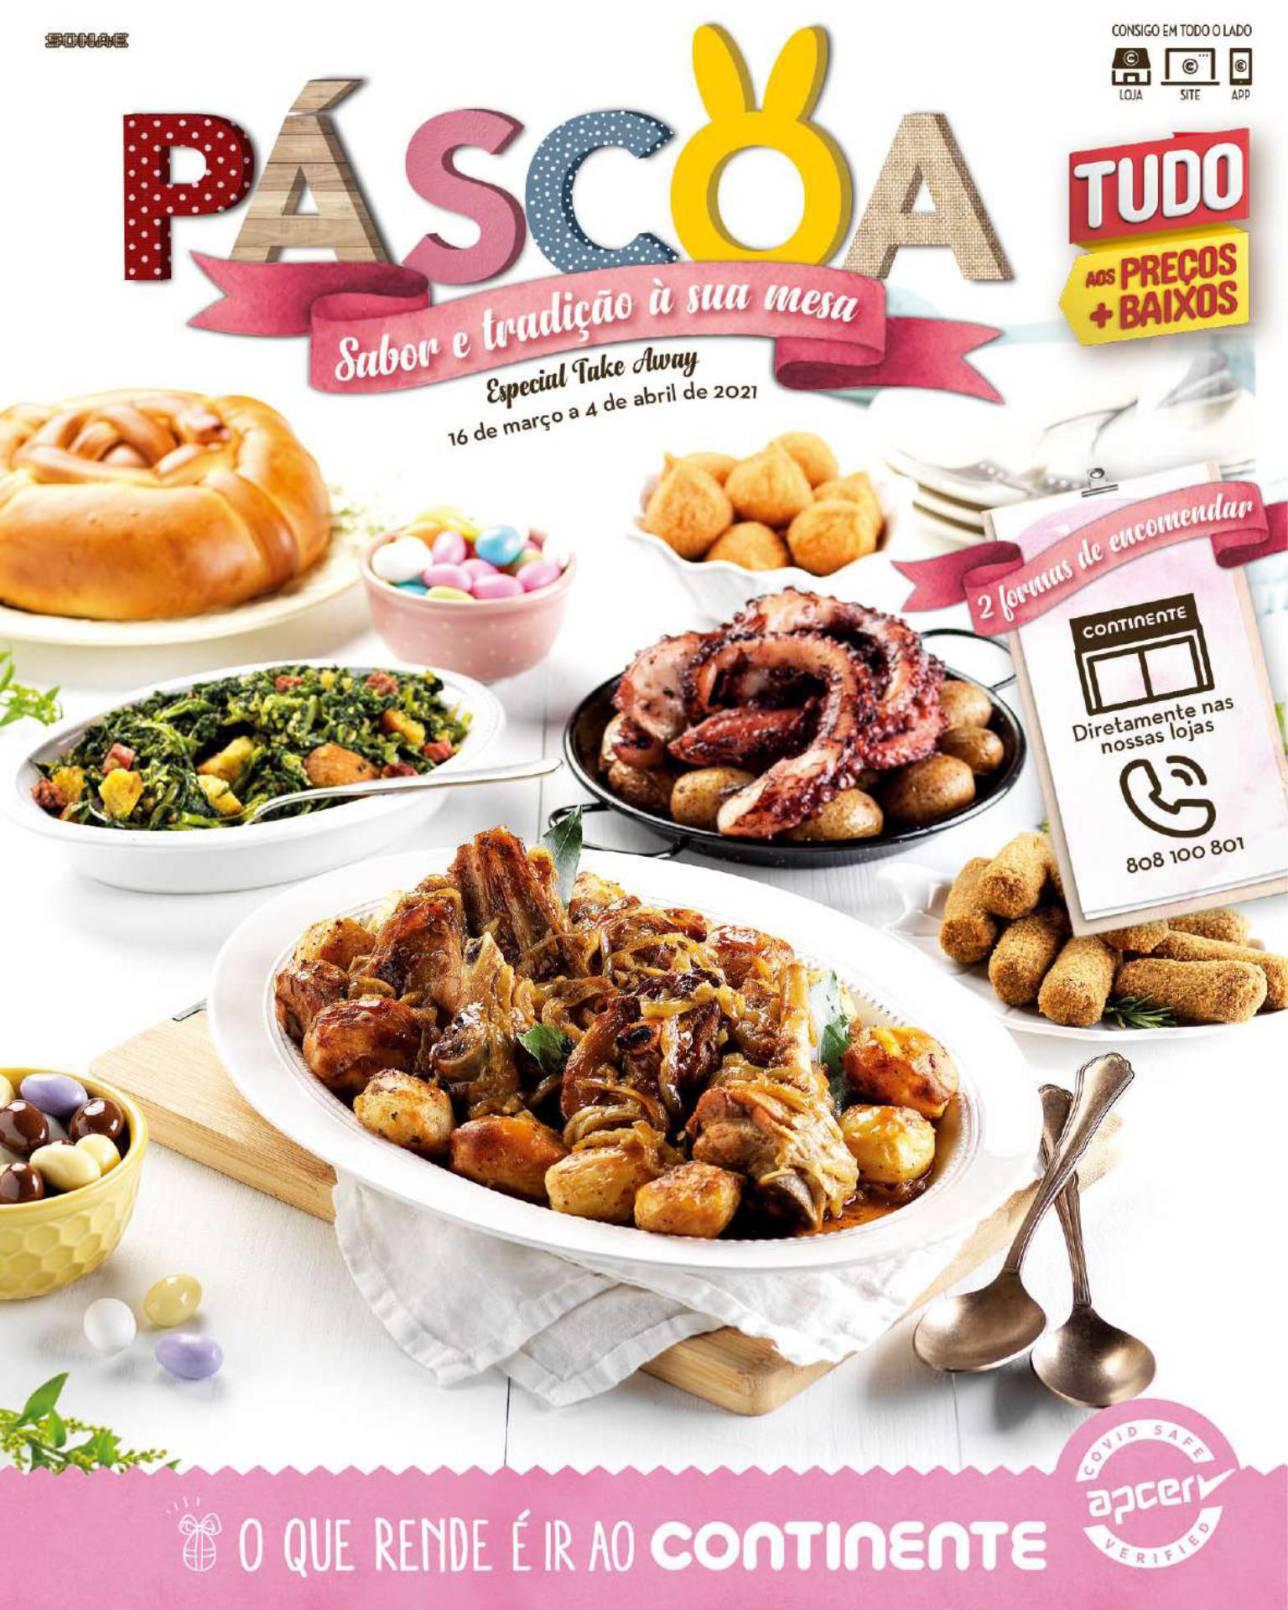 continente folheto pascoa takeaway 16 marco 1